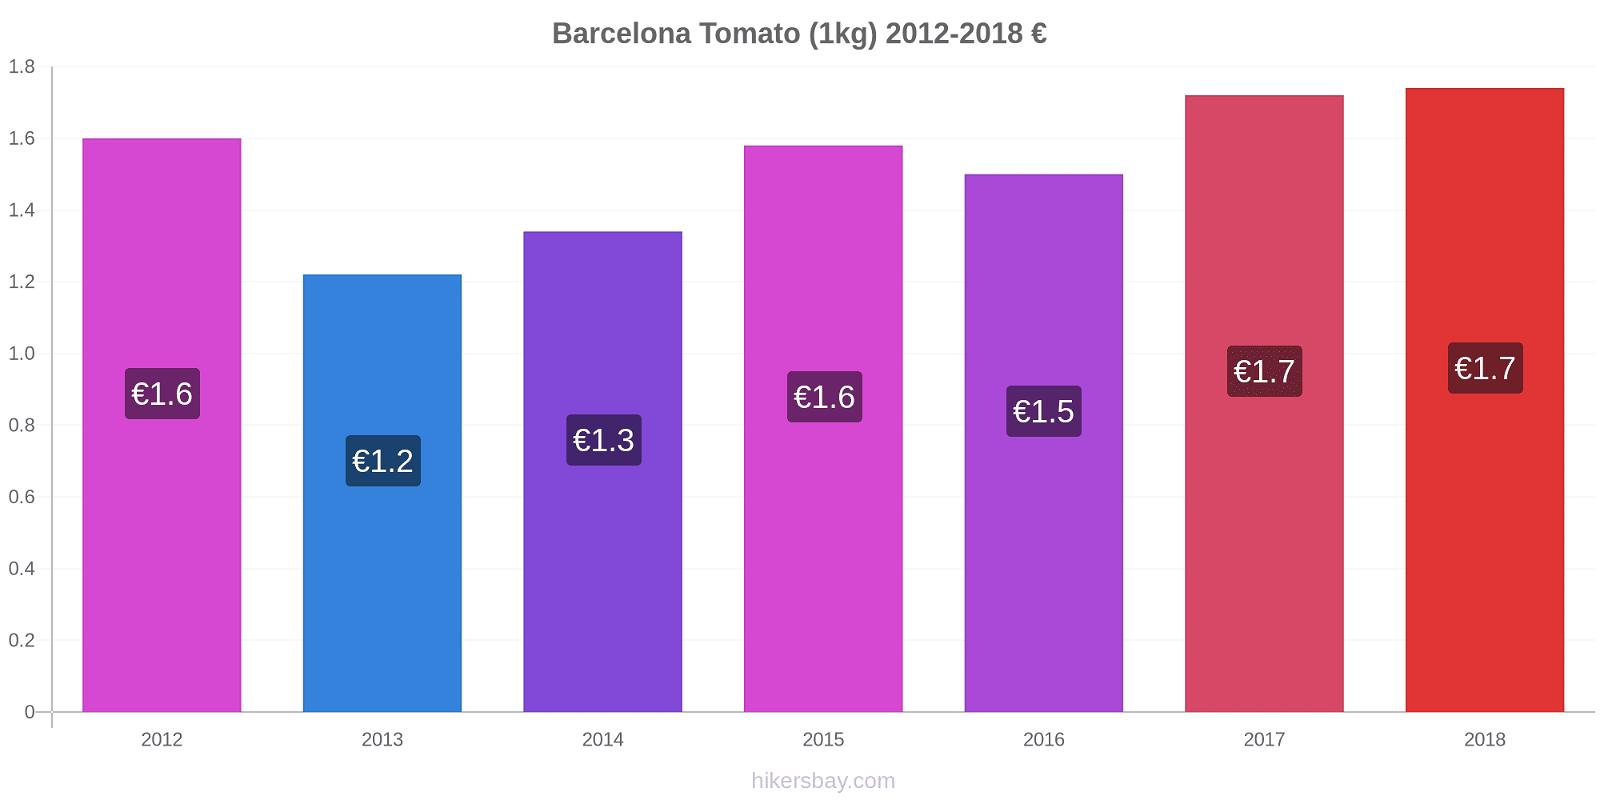 Barcelona price changes Tomato (1kg) hikersbay.com